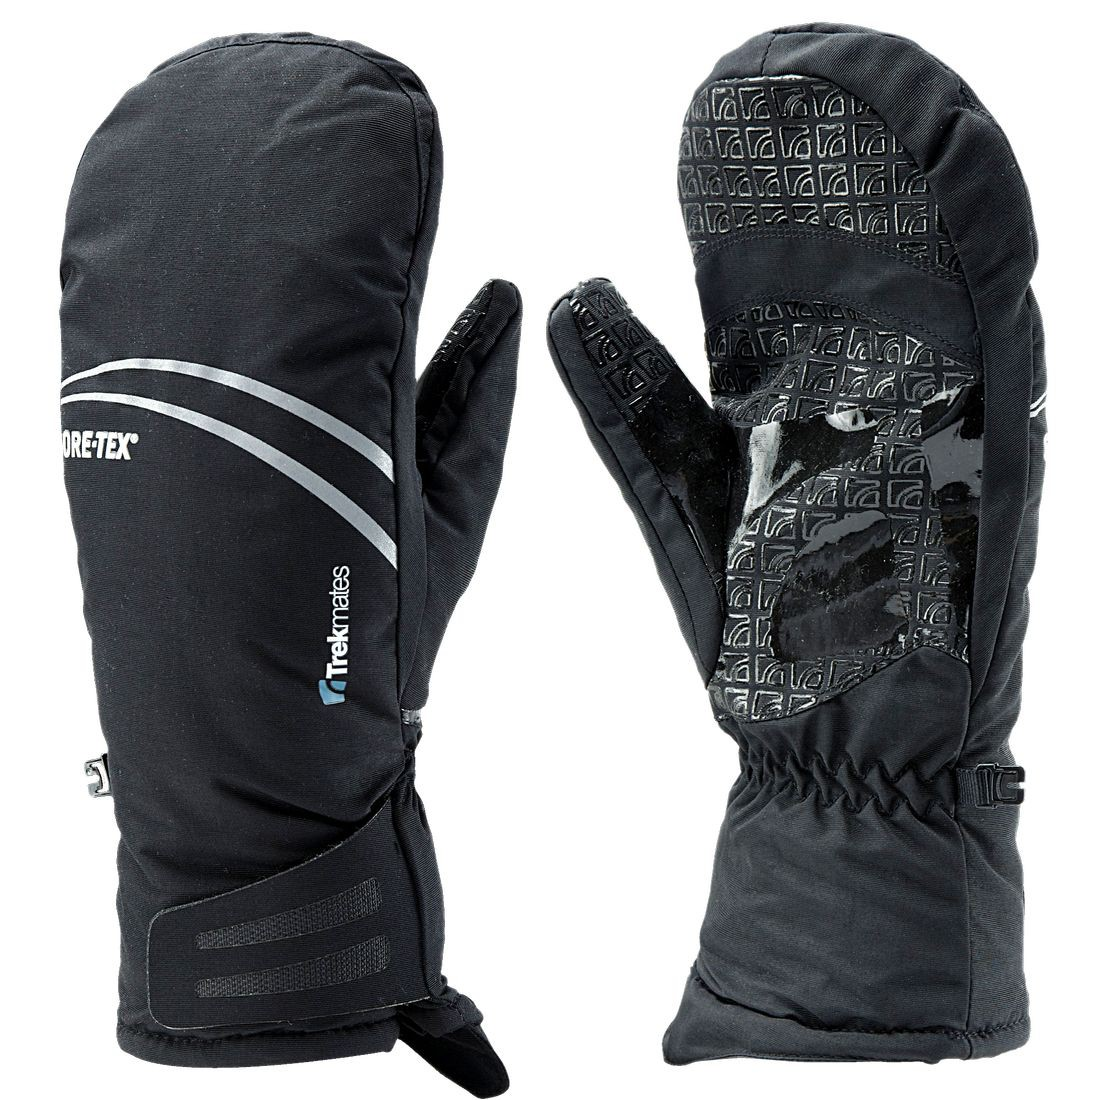 Camping & Outdoor Trekmates Skiddaw L Damen Fingerhandschuh Gore-Tex Handschuh warm wasserdicht Bekleidung